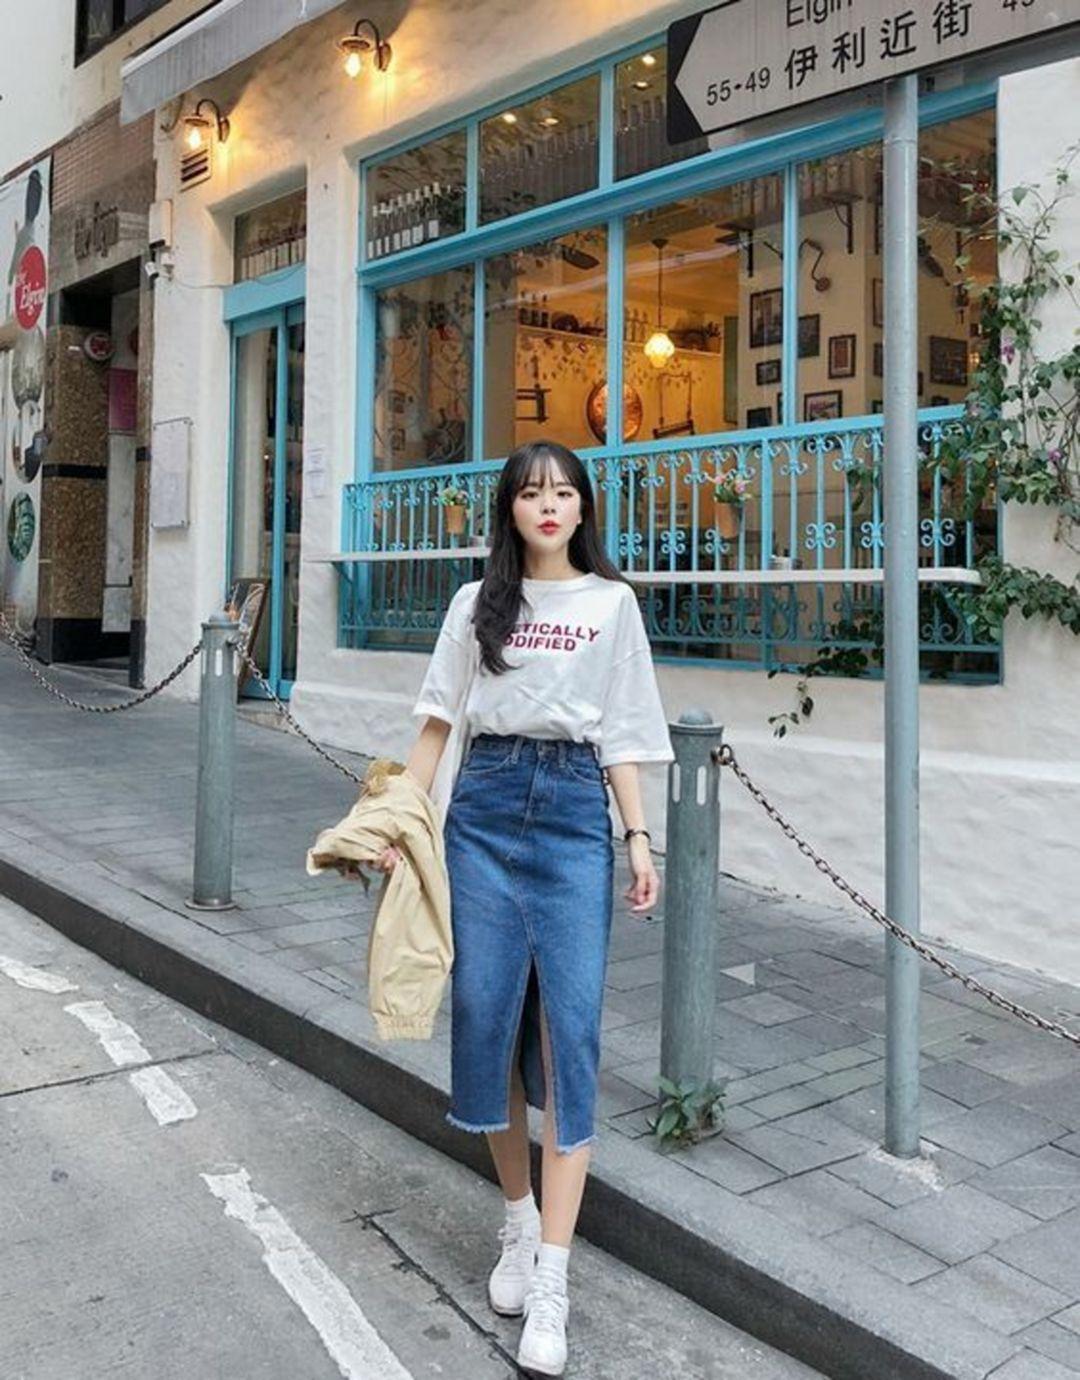 6 Beautiful Korean Girl OOTD Styles That Make Hangouts More